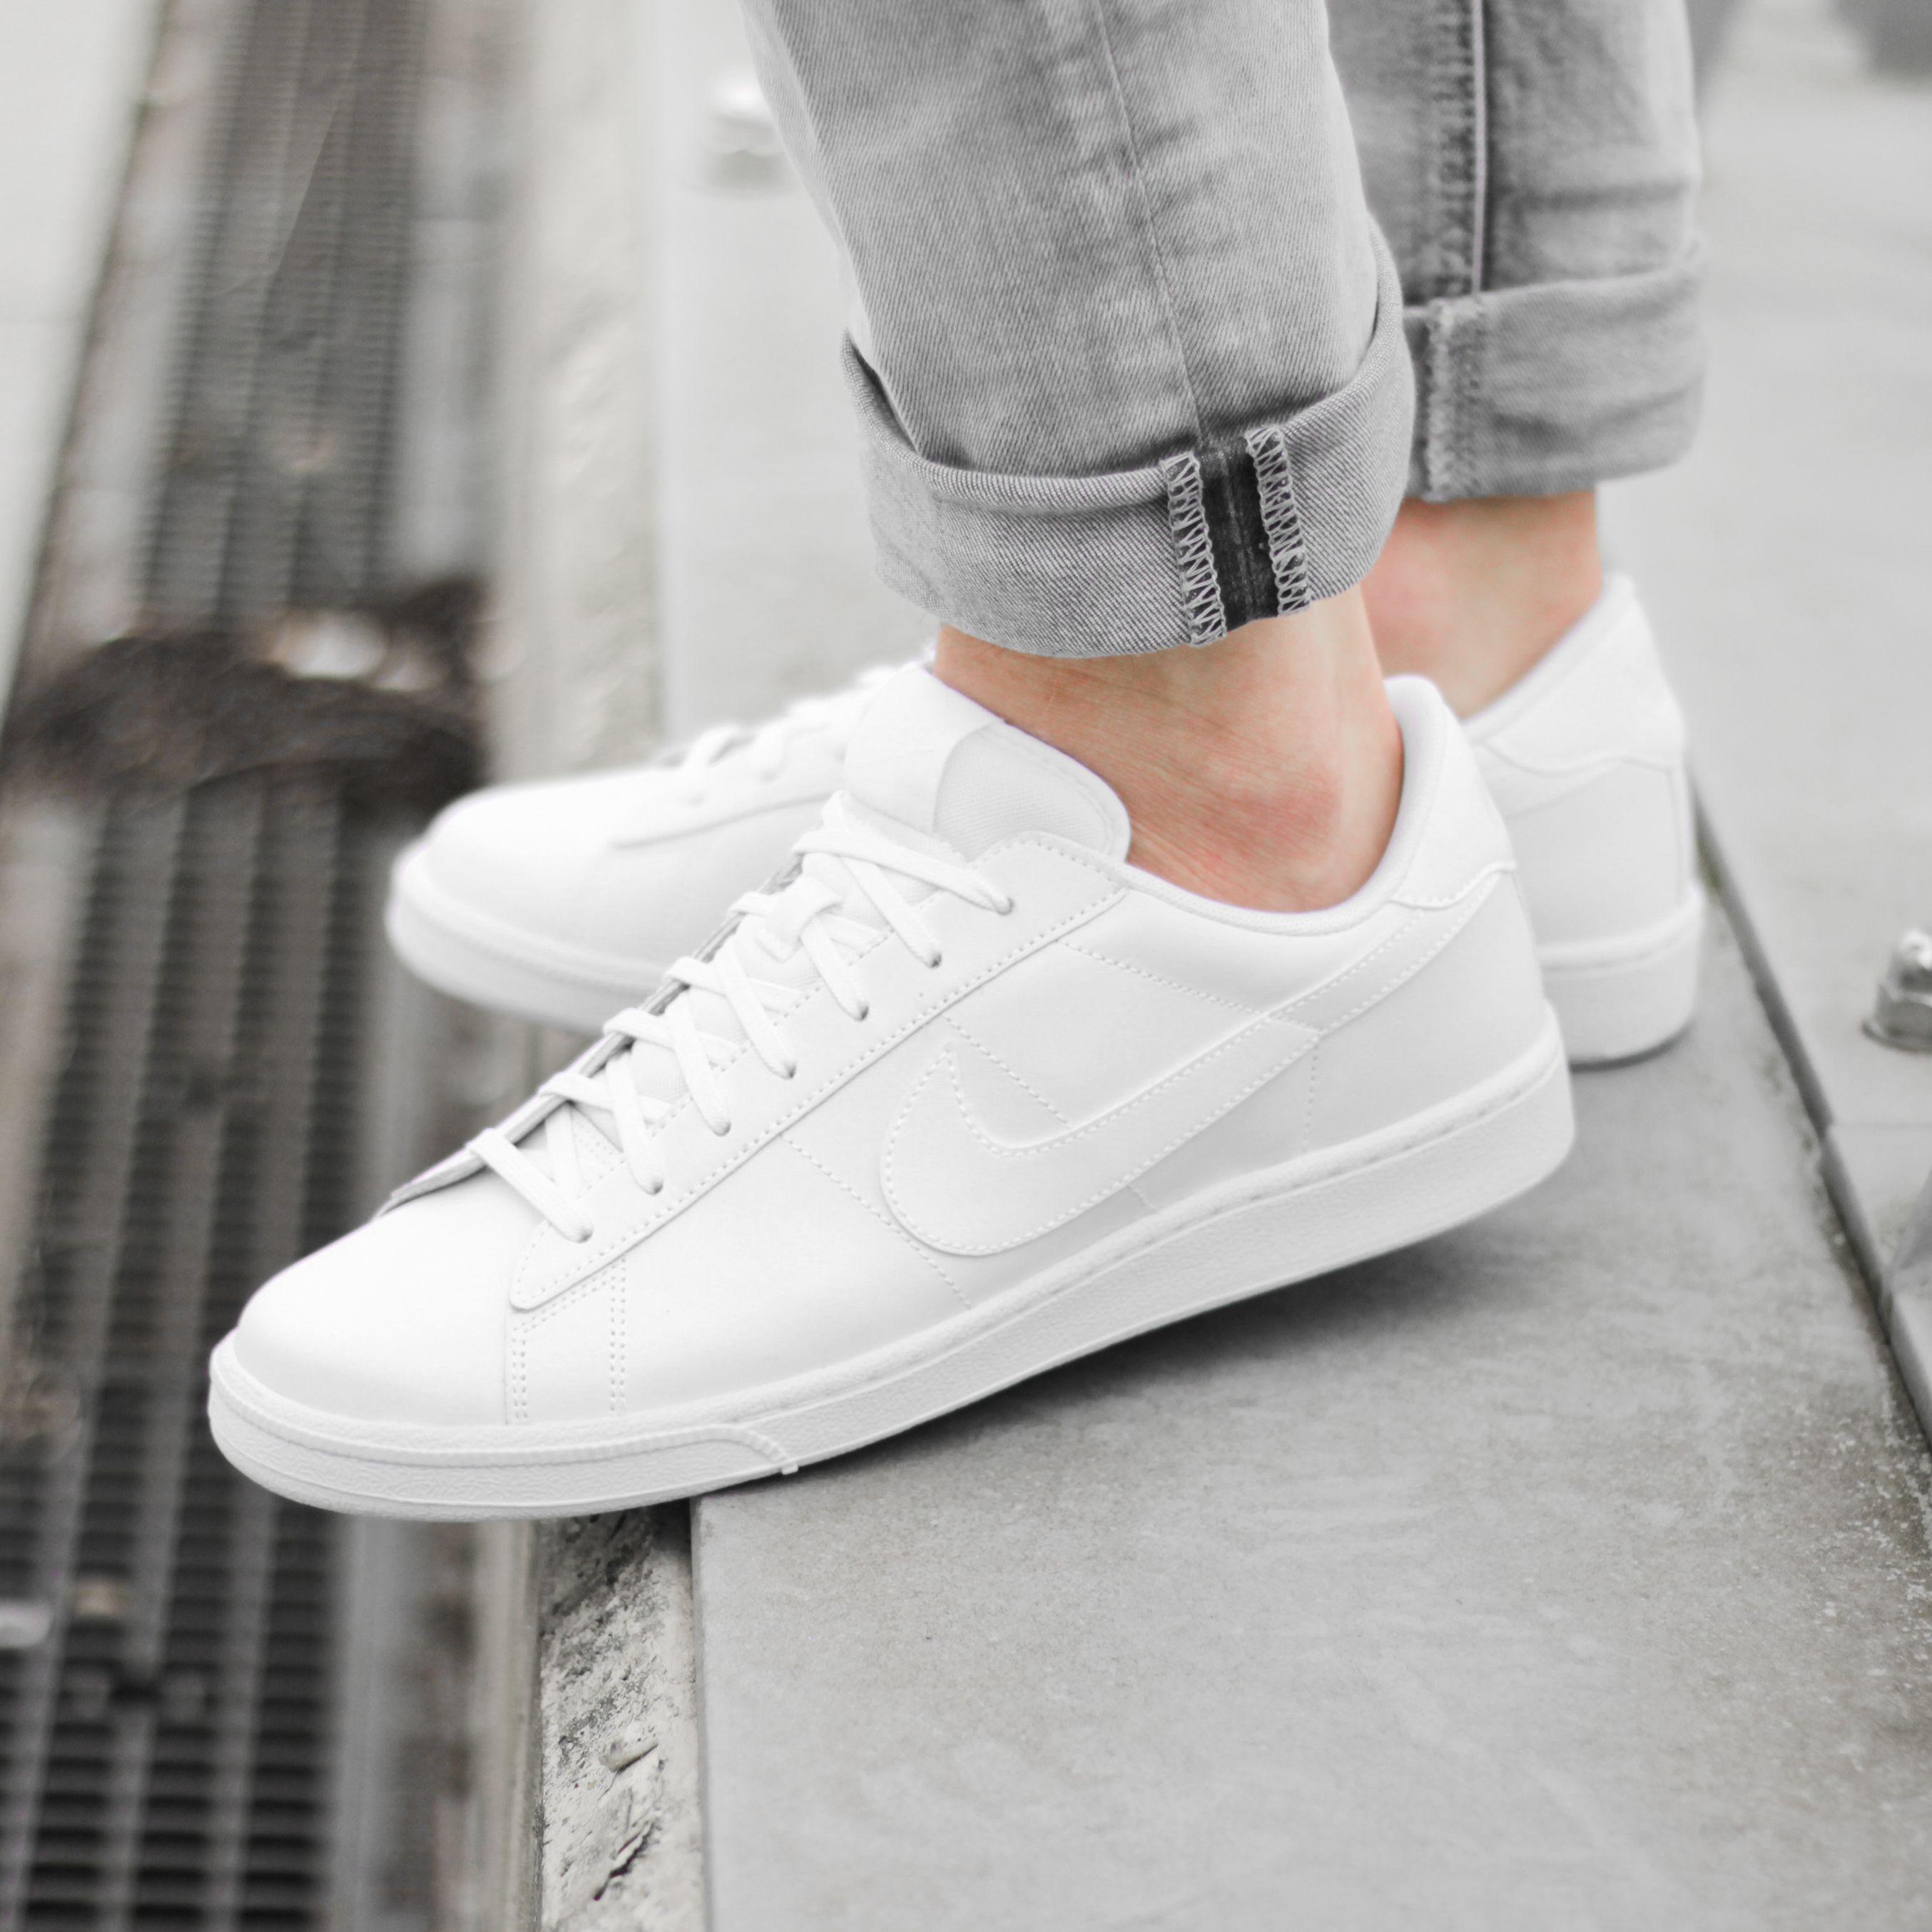 Brilliant 31 Amazing Nike Shoes Sneakers Women U2013 Playzoa.com